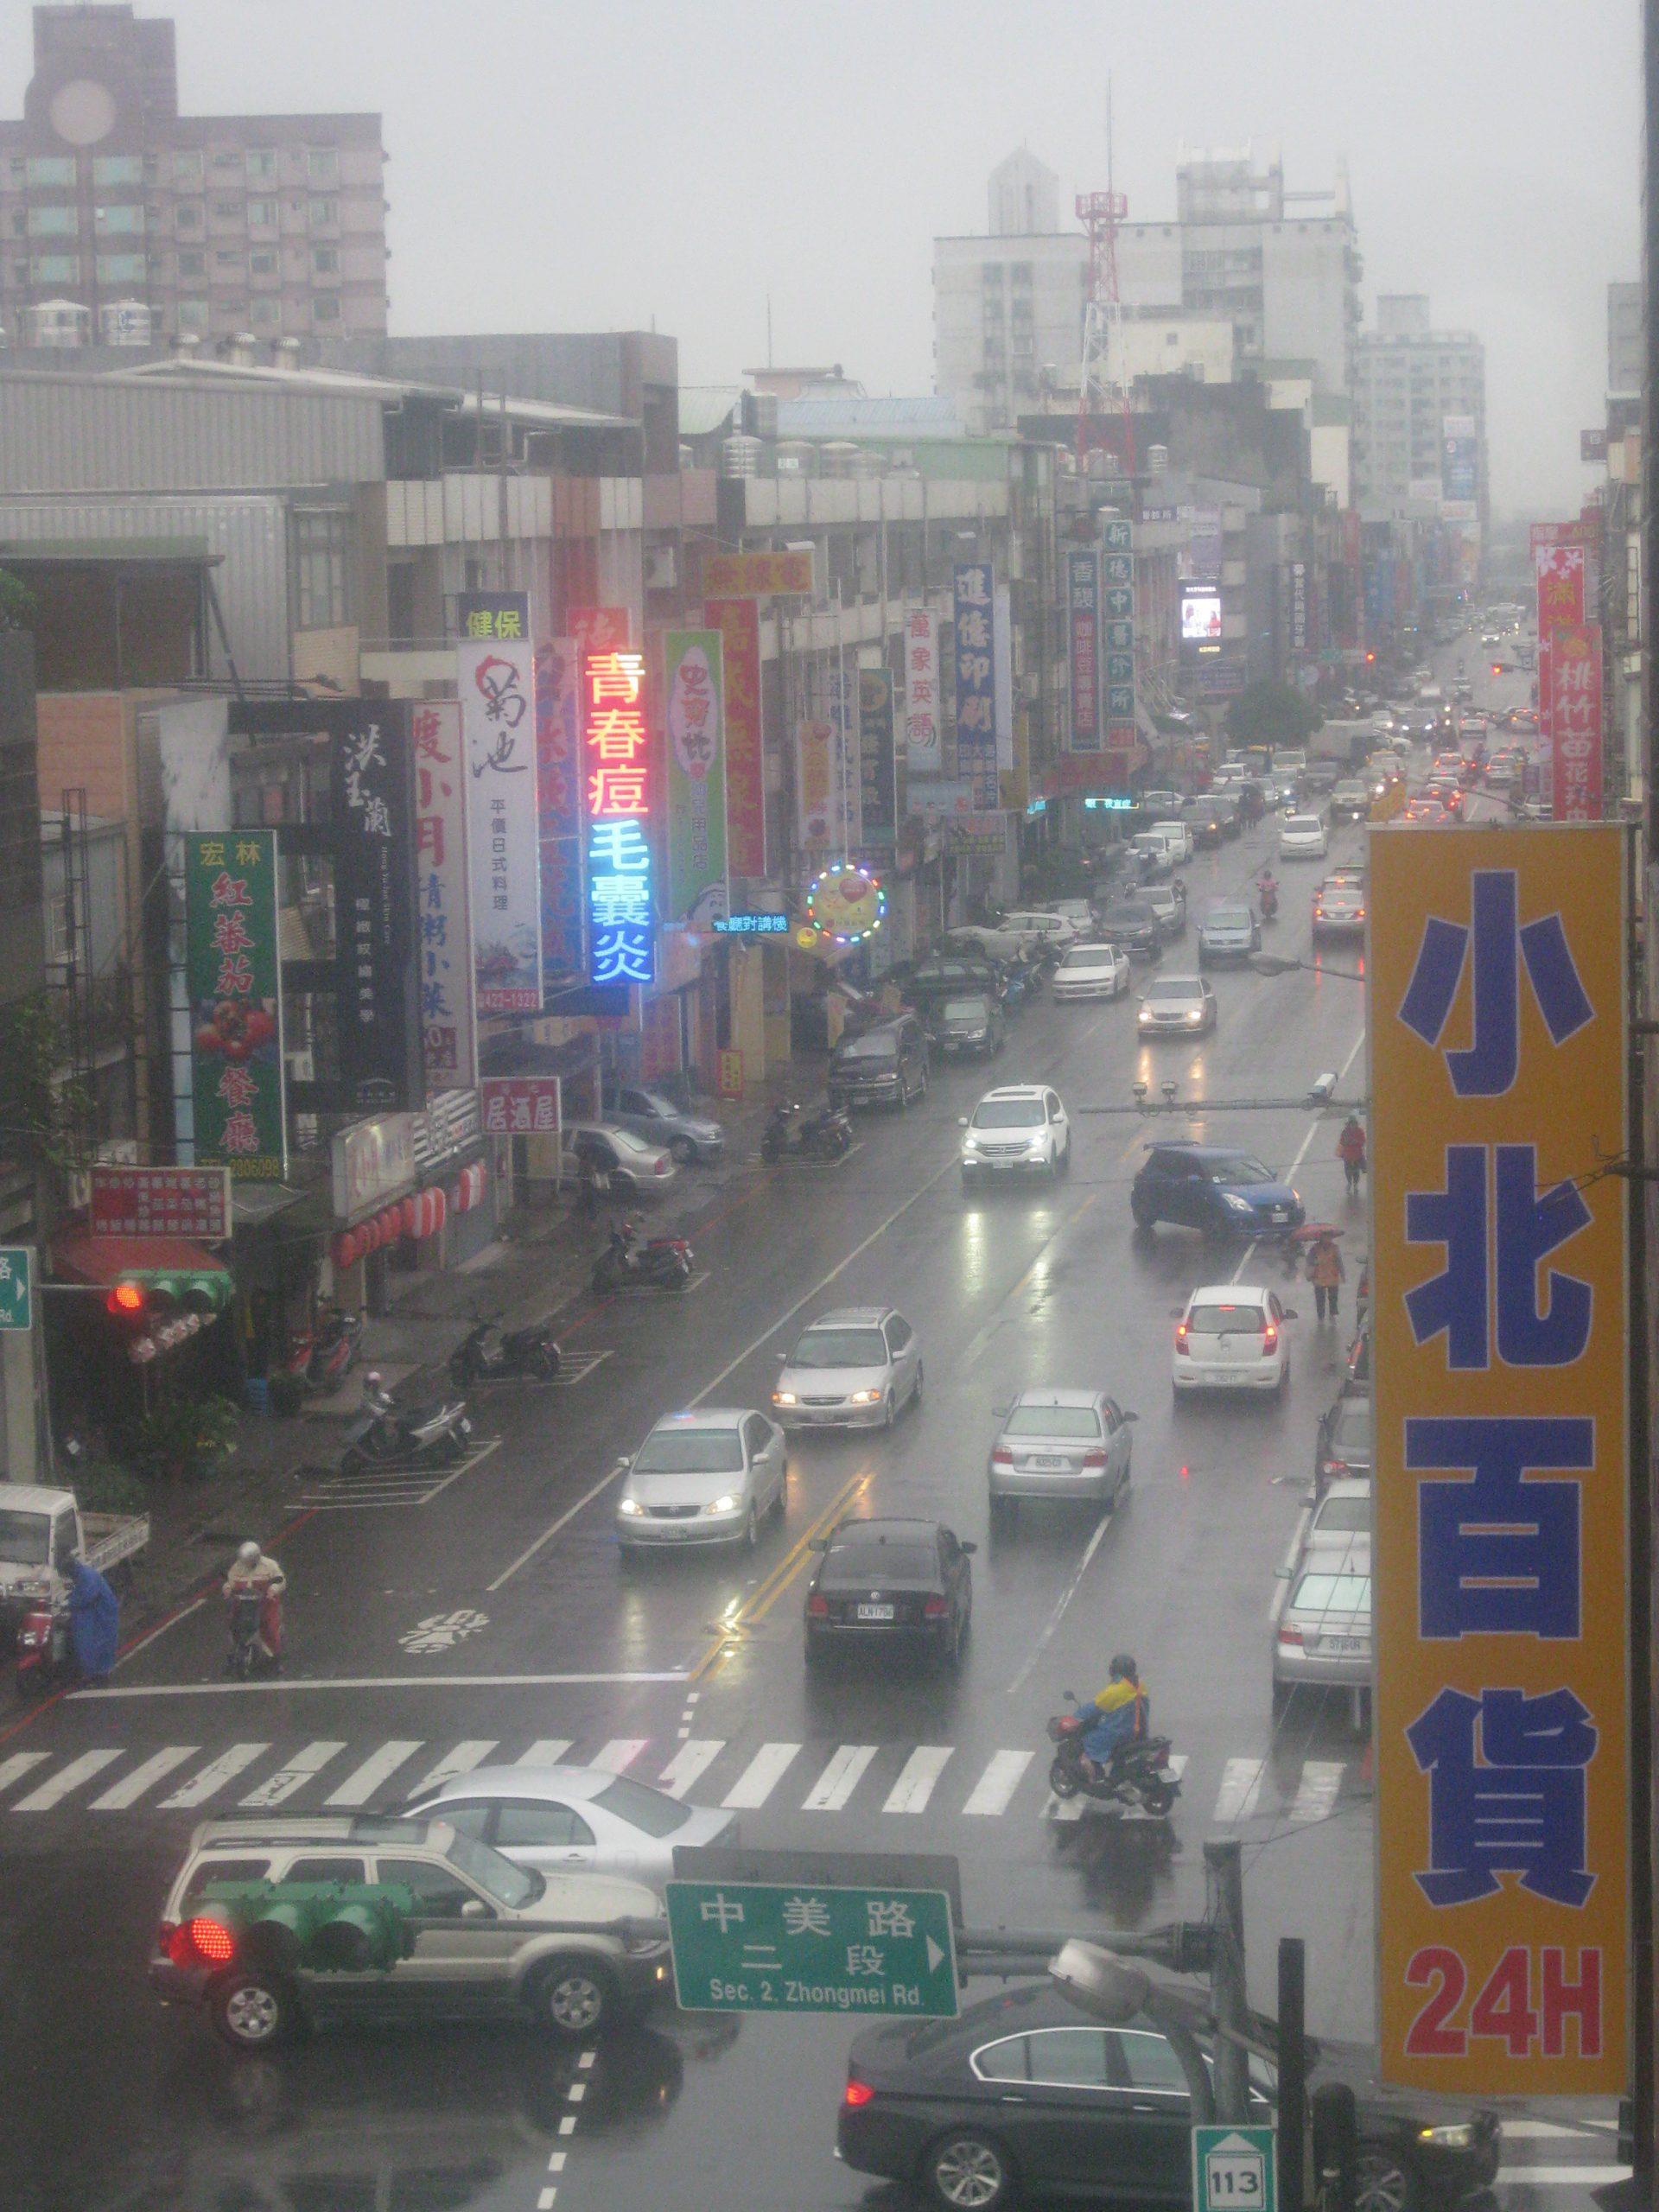 Arrivée à Taïwan